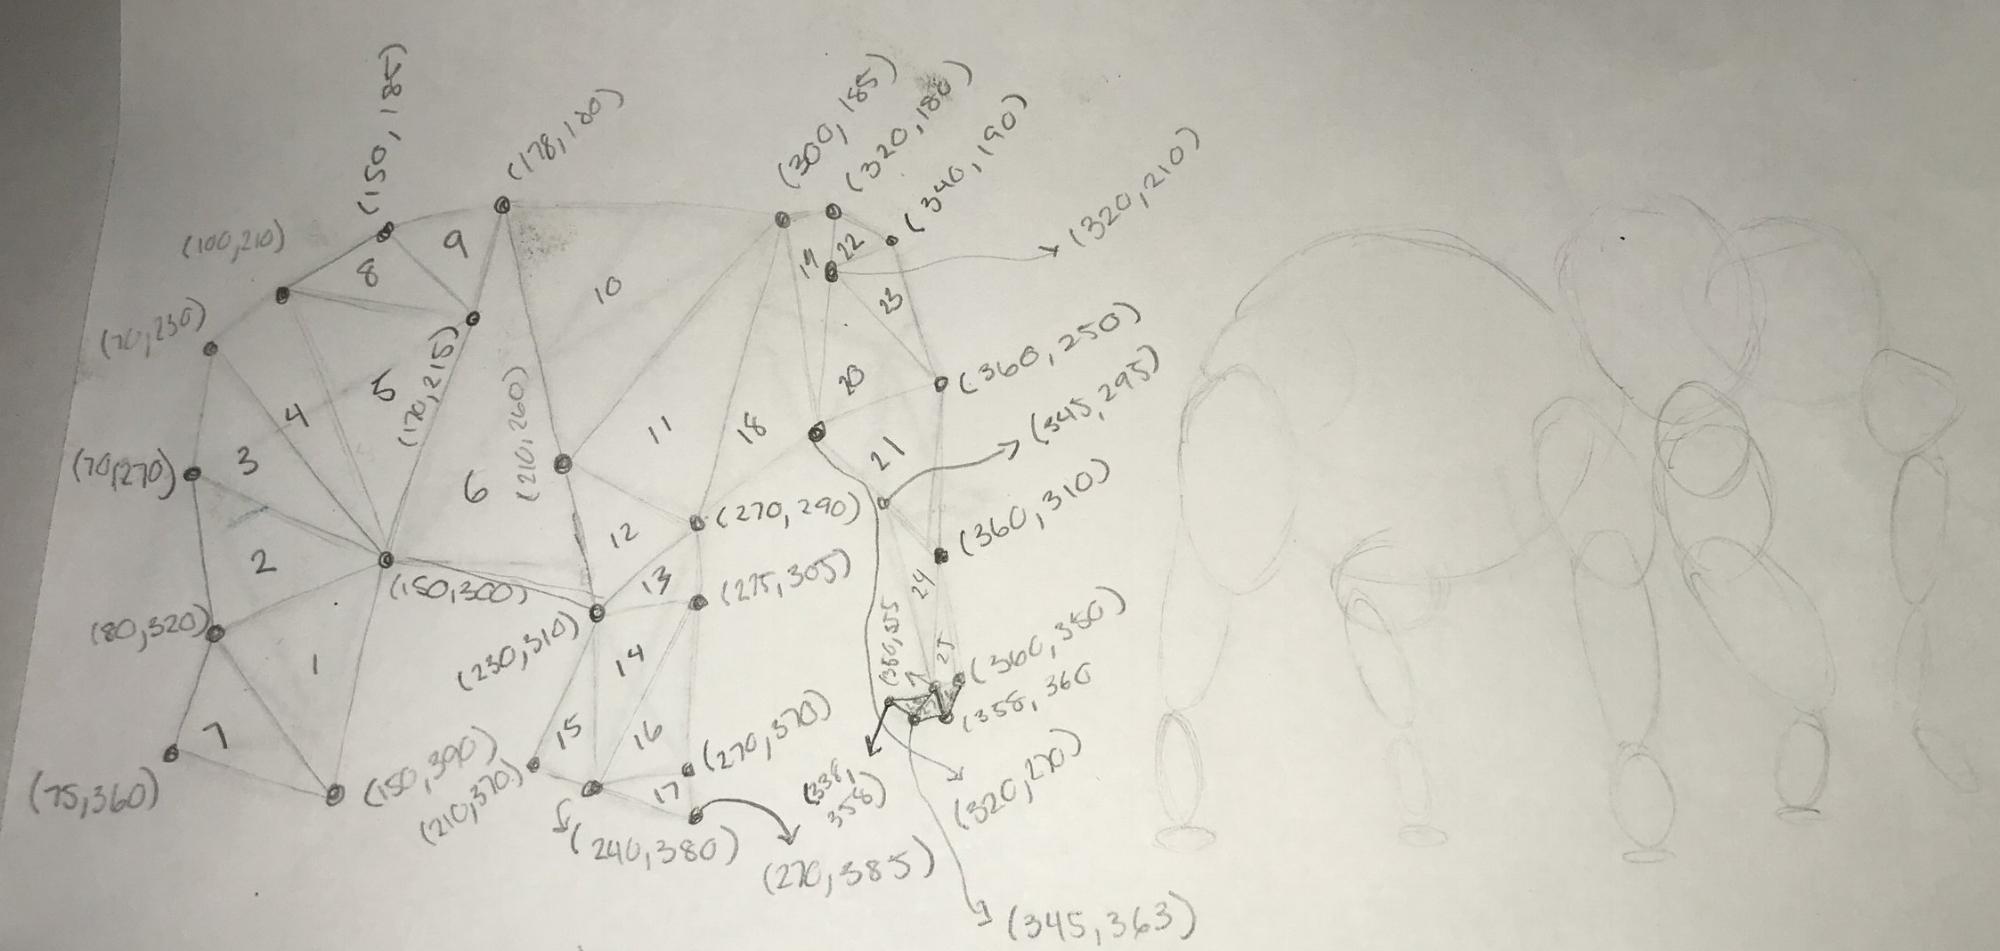 Figure 2 : Paper sketch/map